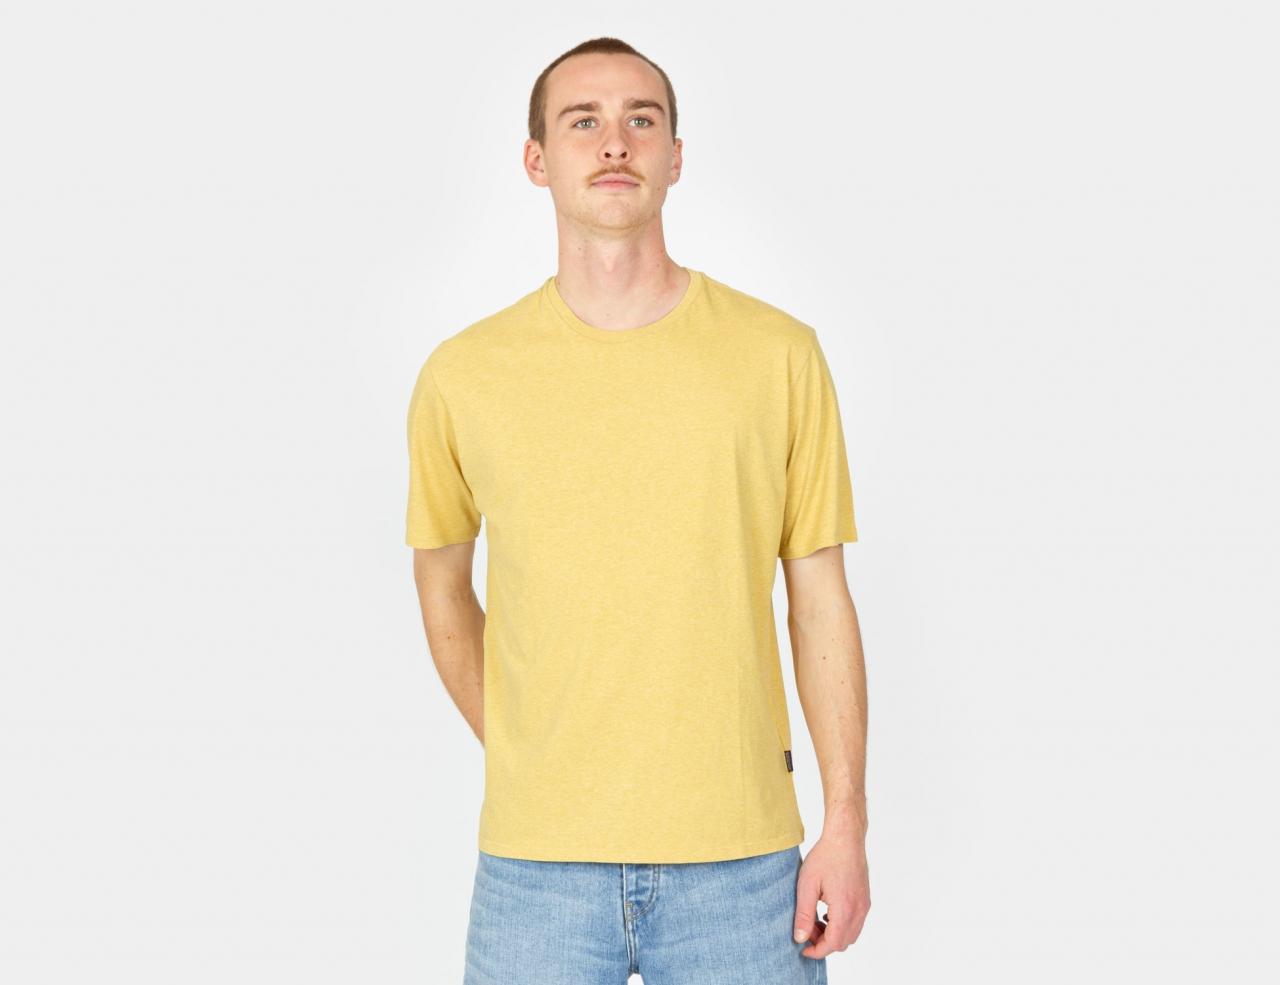 Patagonia Road To Regenerative Lightweight Shirt - Surfboard Yellow